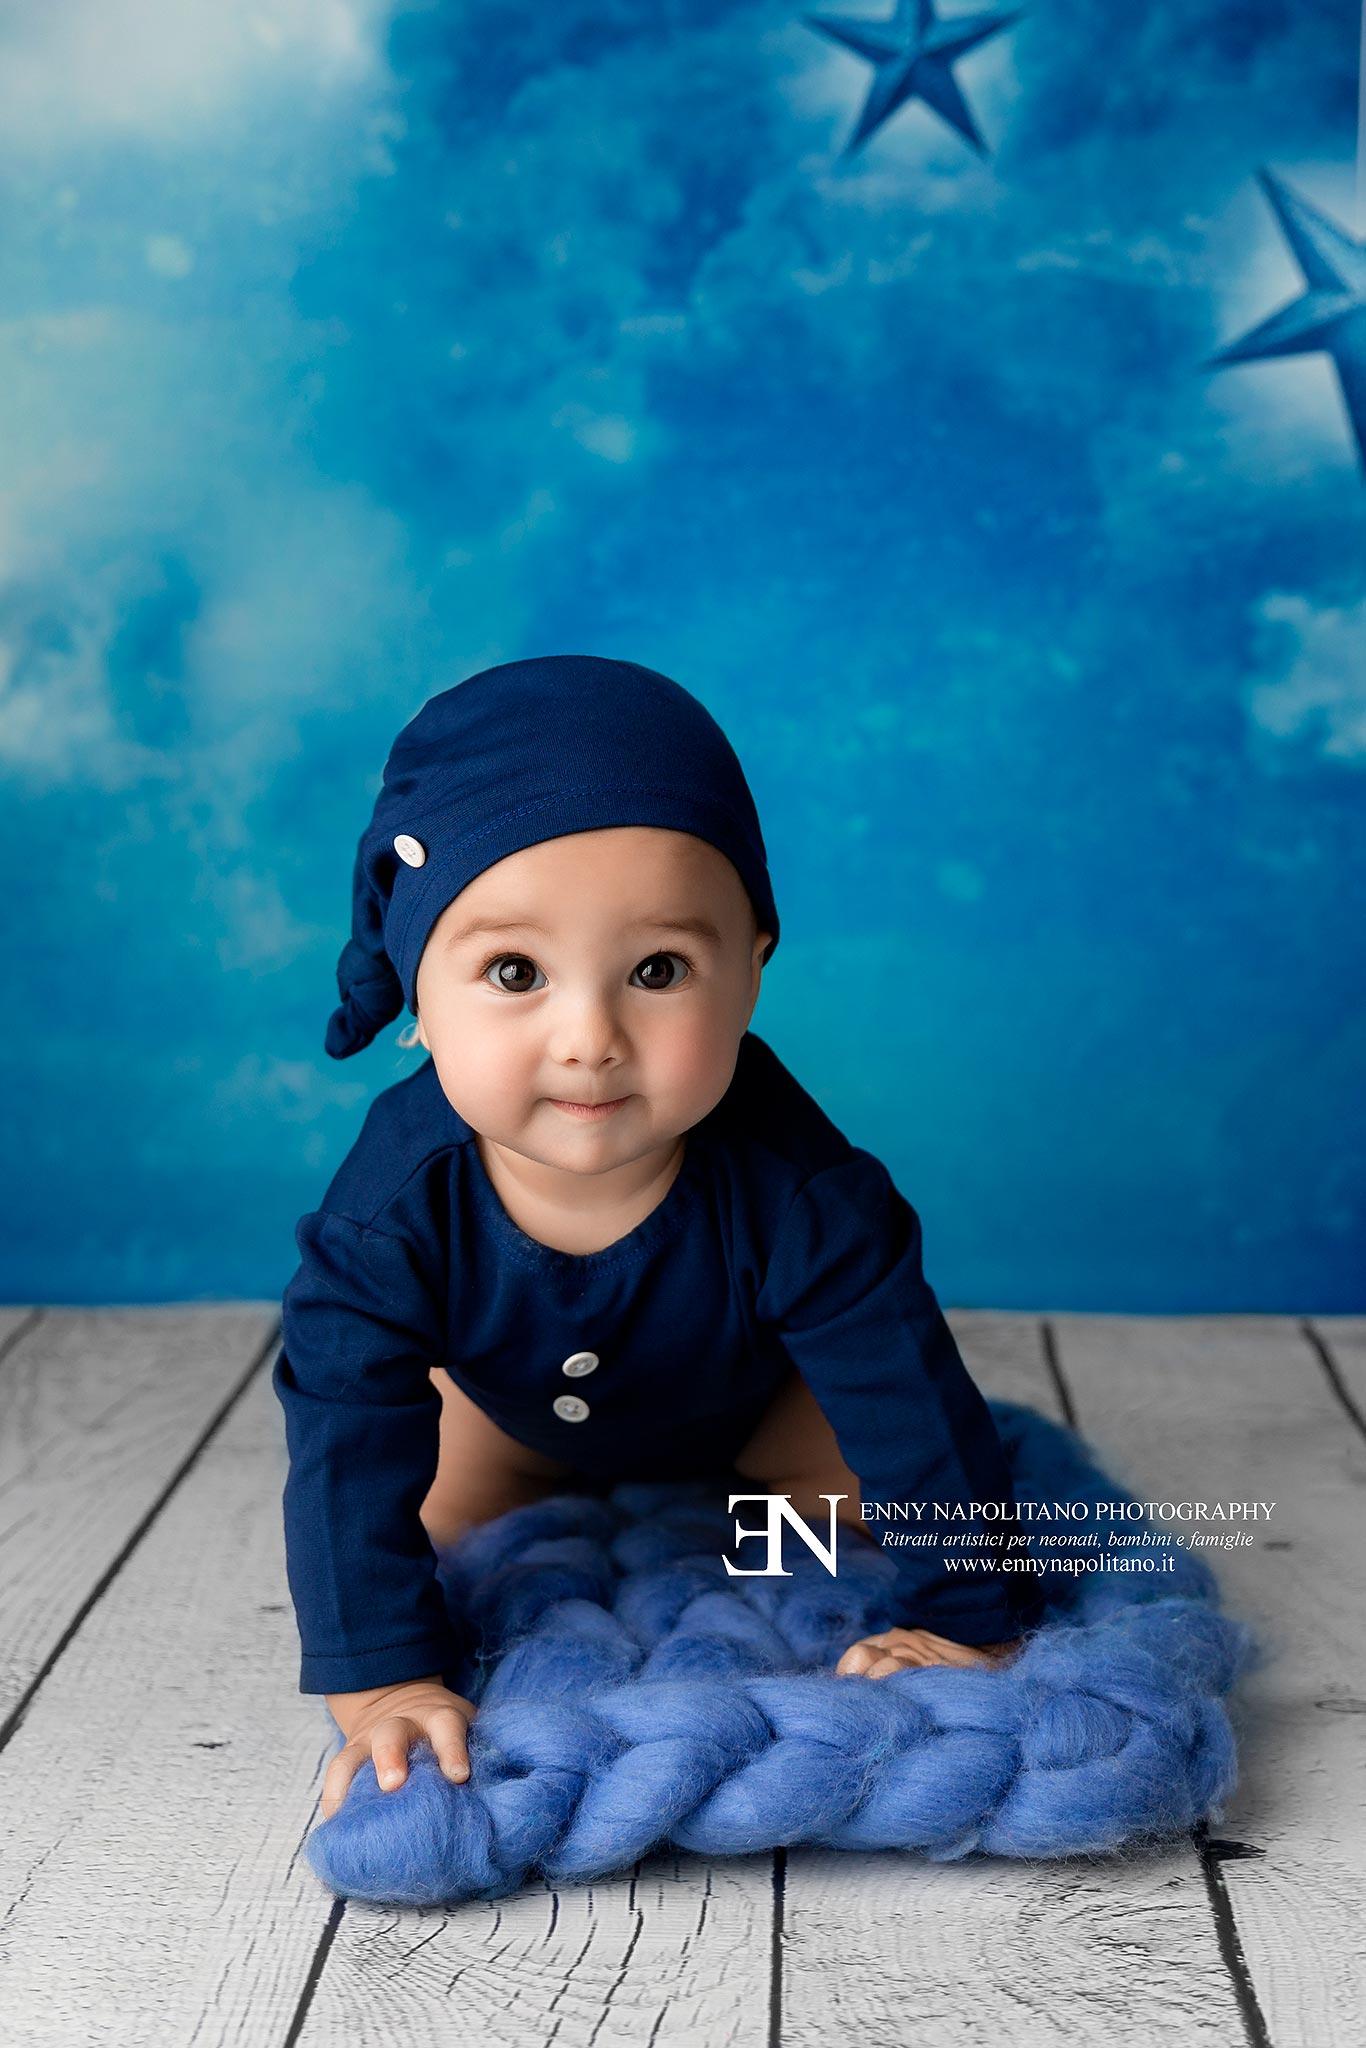 Fotografo bambini 6 mesi Milano, Monza, Pavia, Bergamo, Pavia